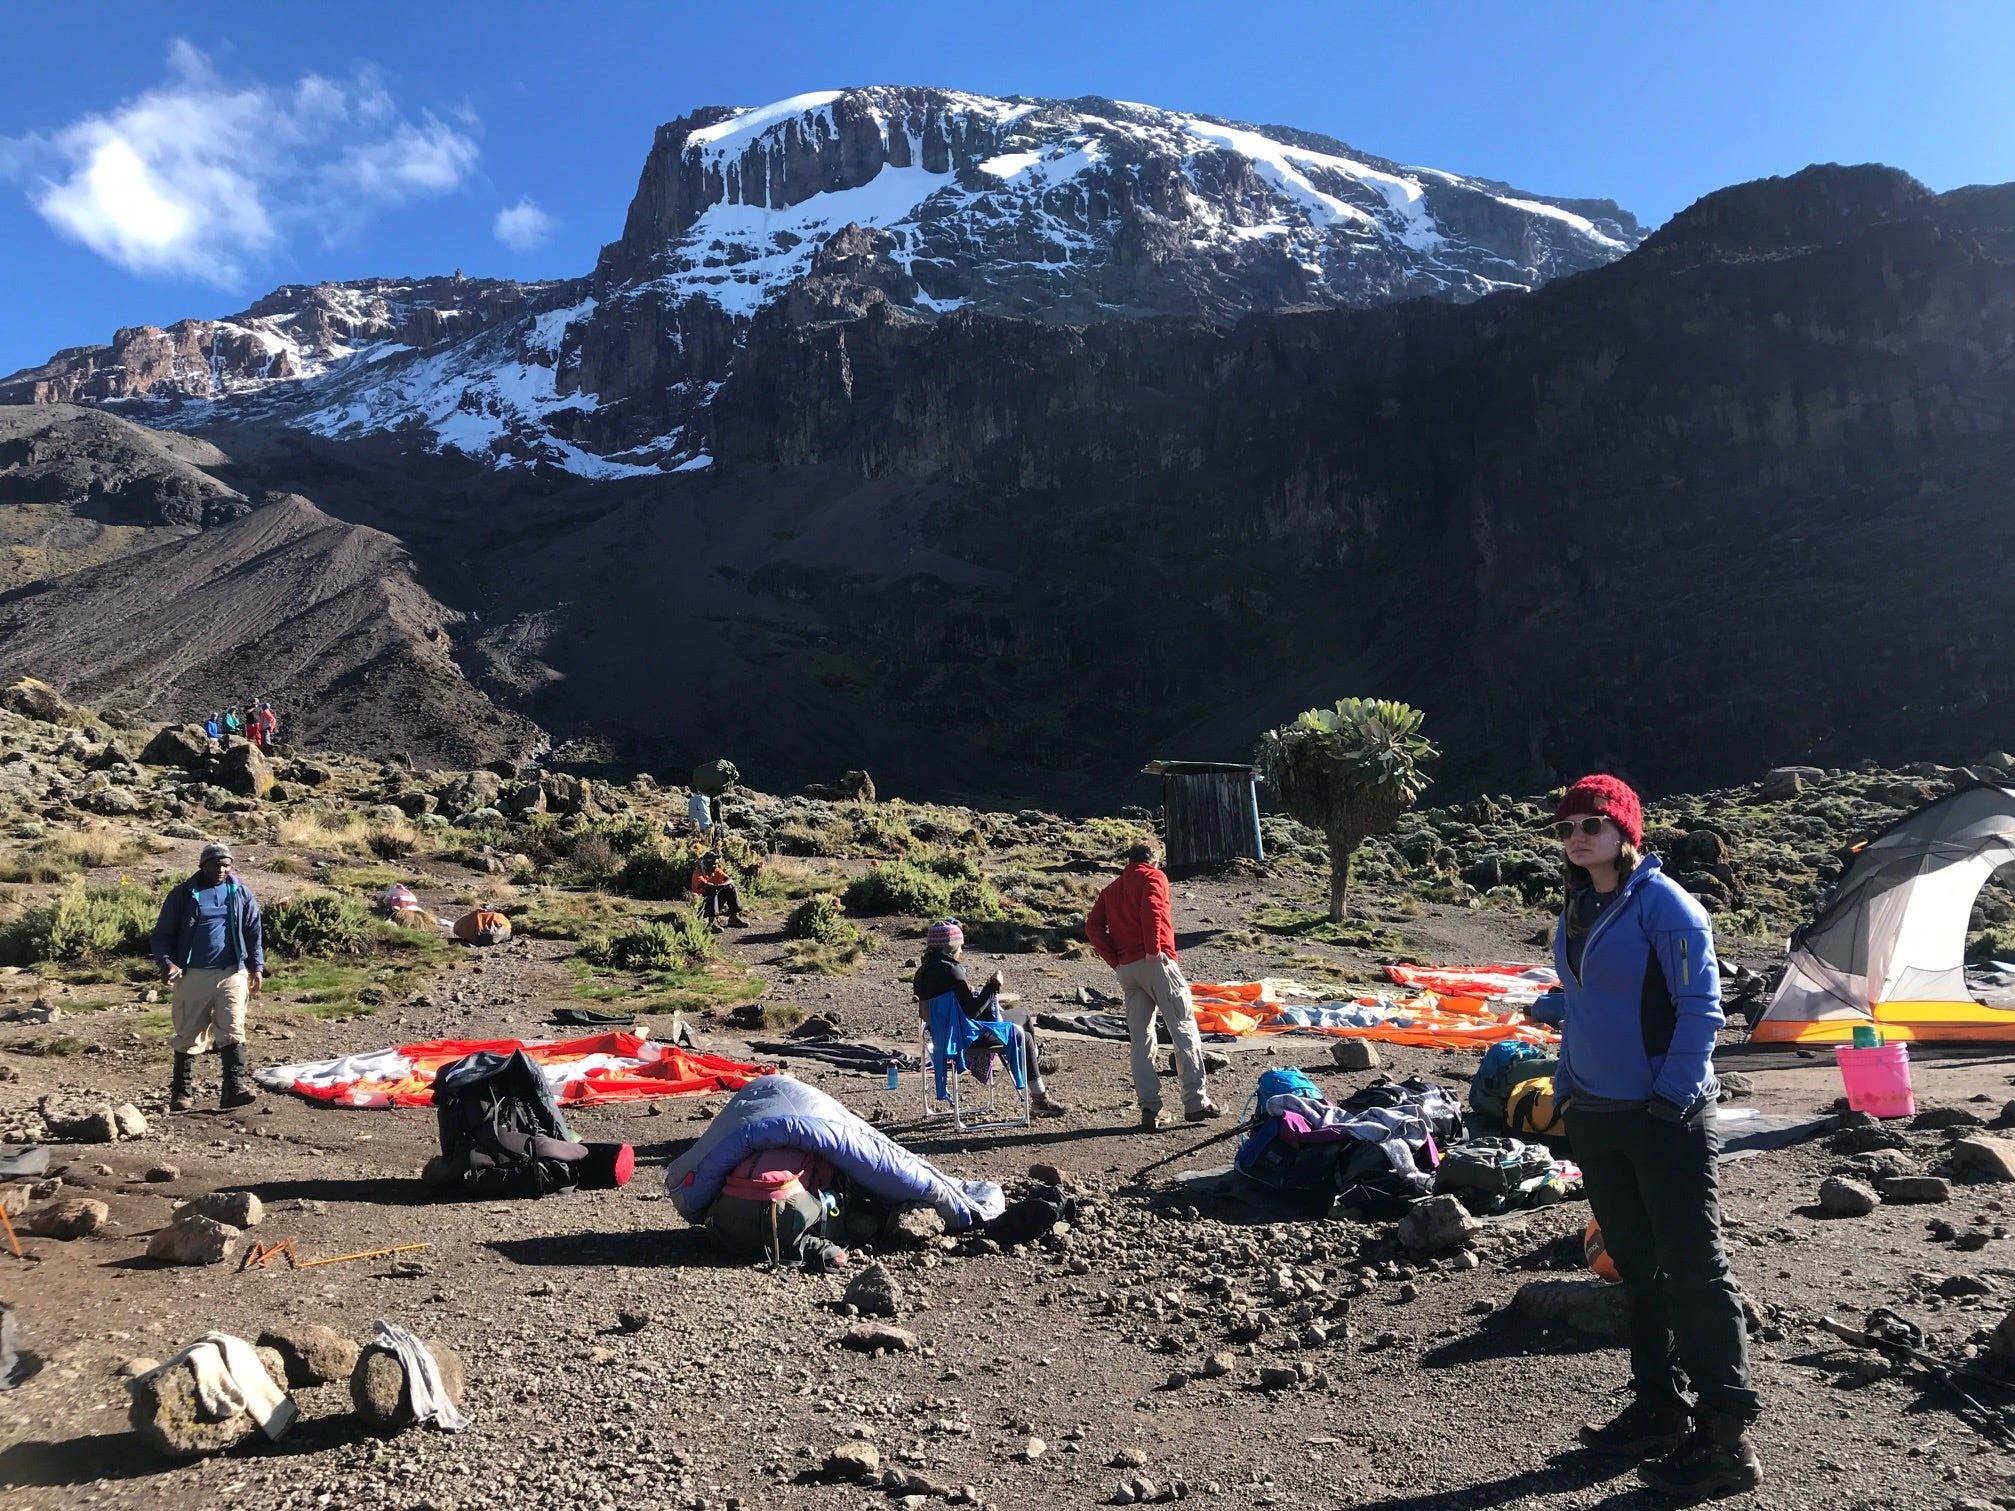 Jordan Grantz waits to begin trekking at Barranco Wall camp on Mount Kilimanjaro, Tanzania